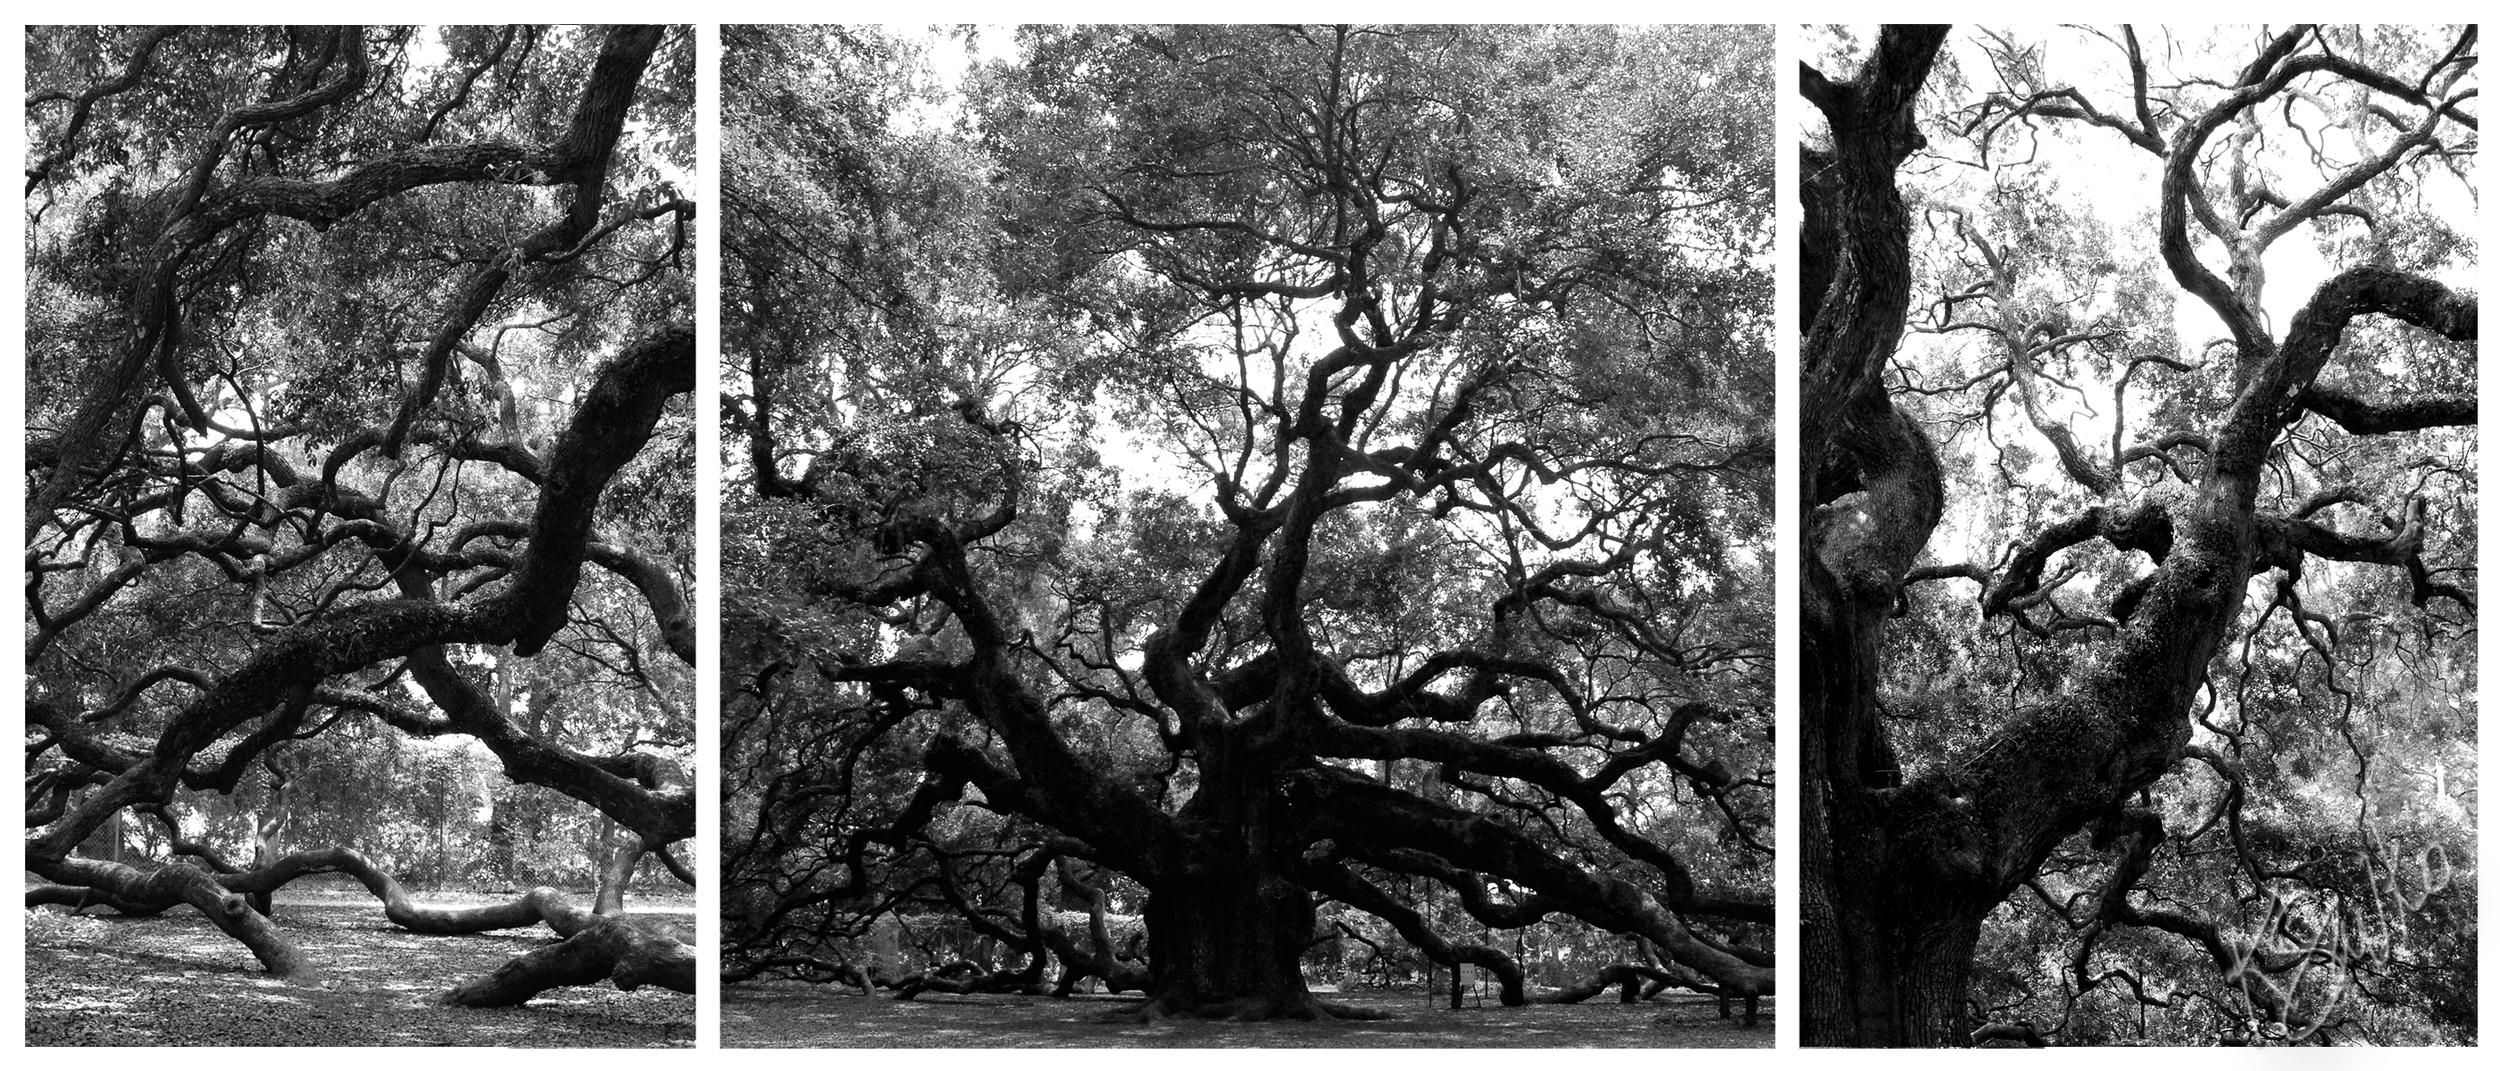 savko_trees.jpg